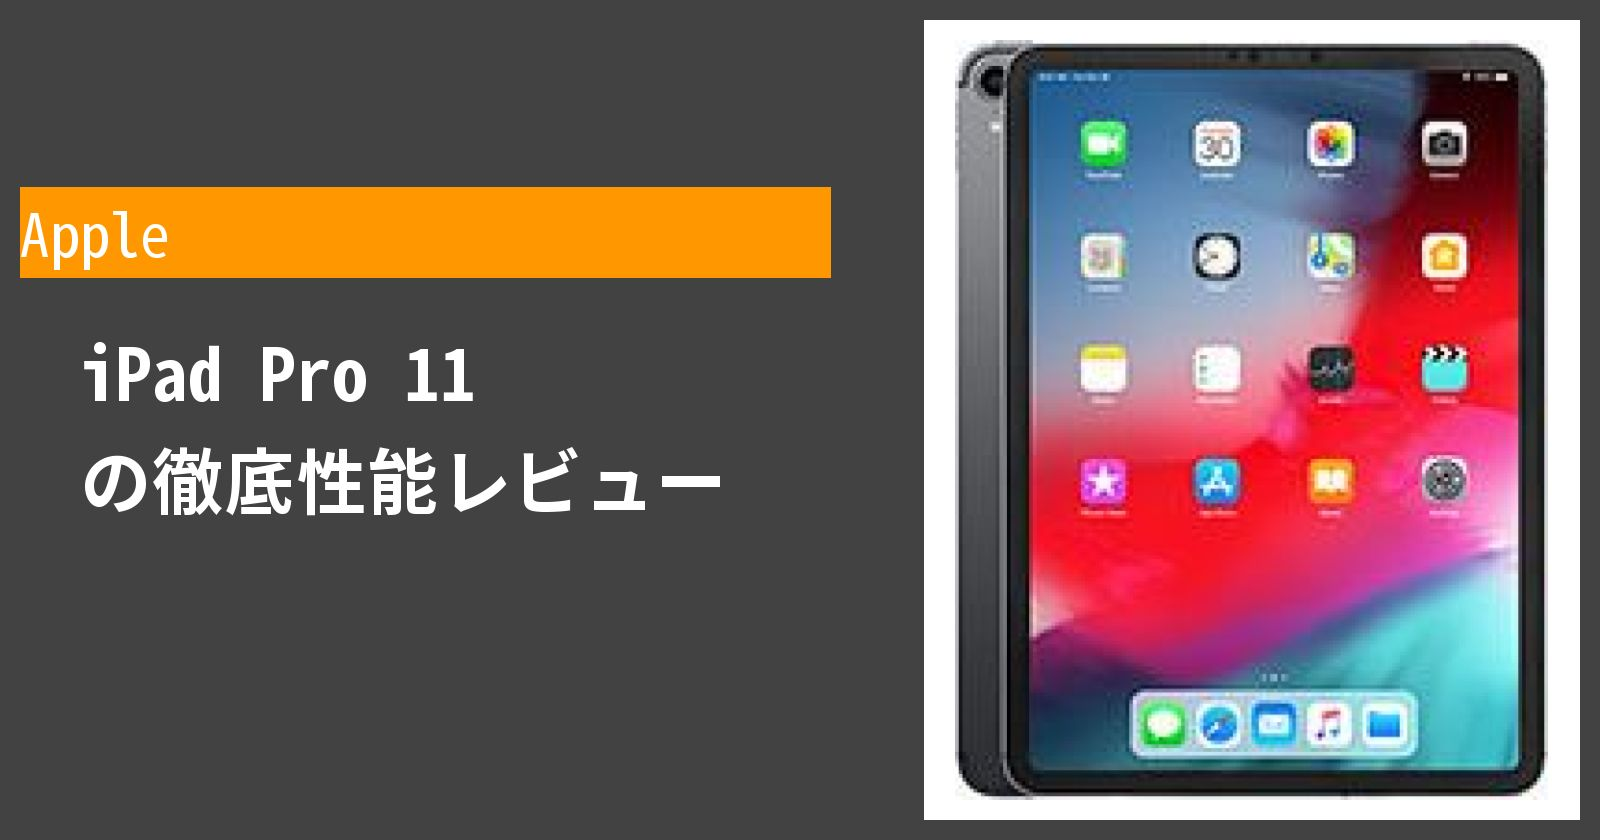 iPad Pro 11 (2018) の徹底性能レビュー